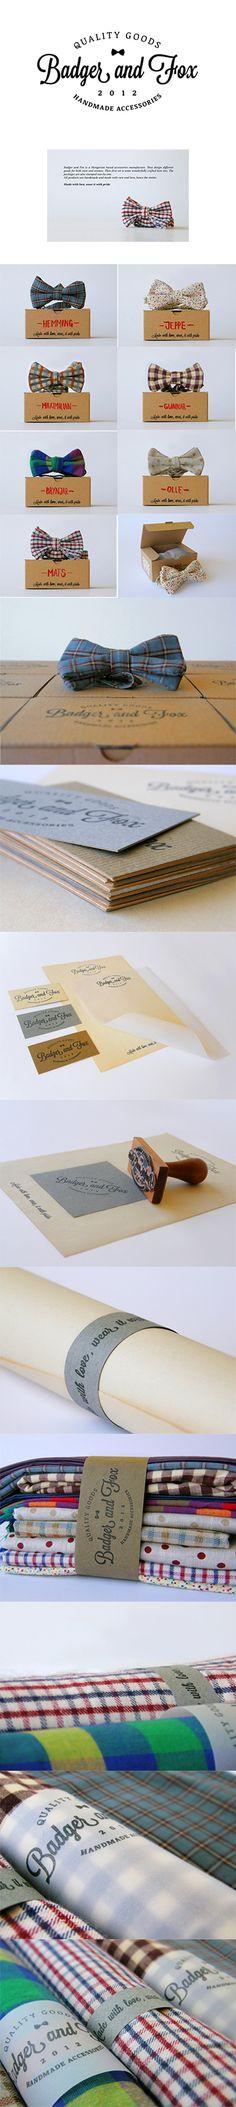 Packaging & Presentation #creativemarketing #badgerandfox #bowties